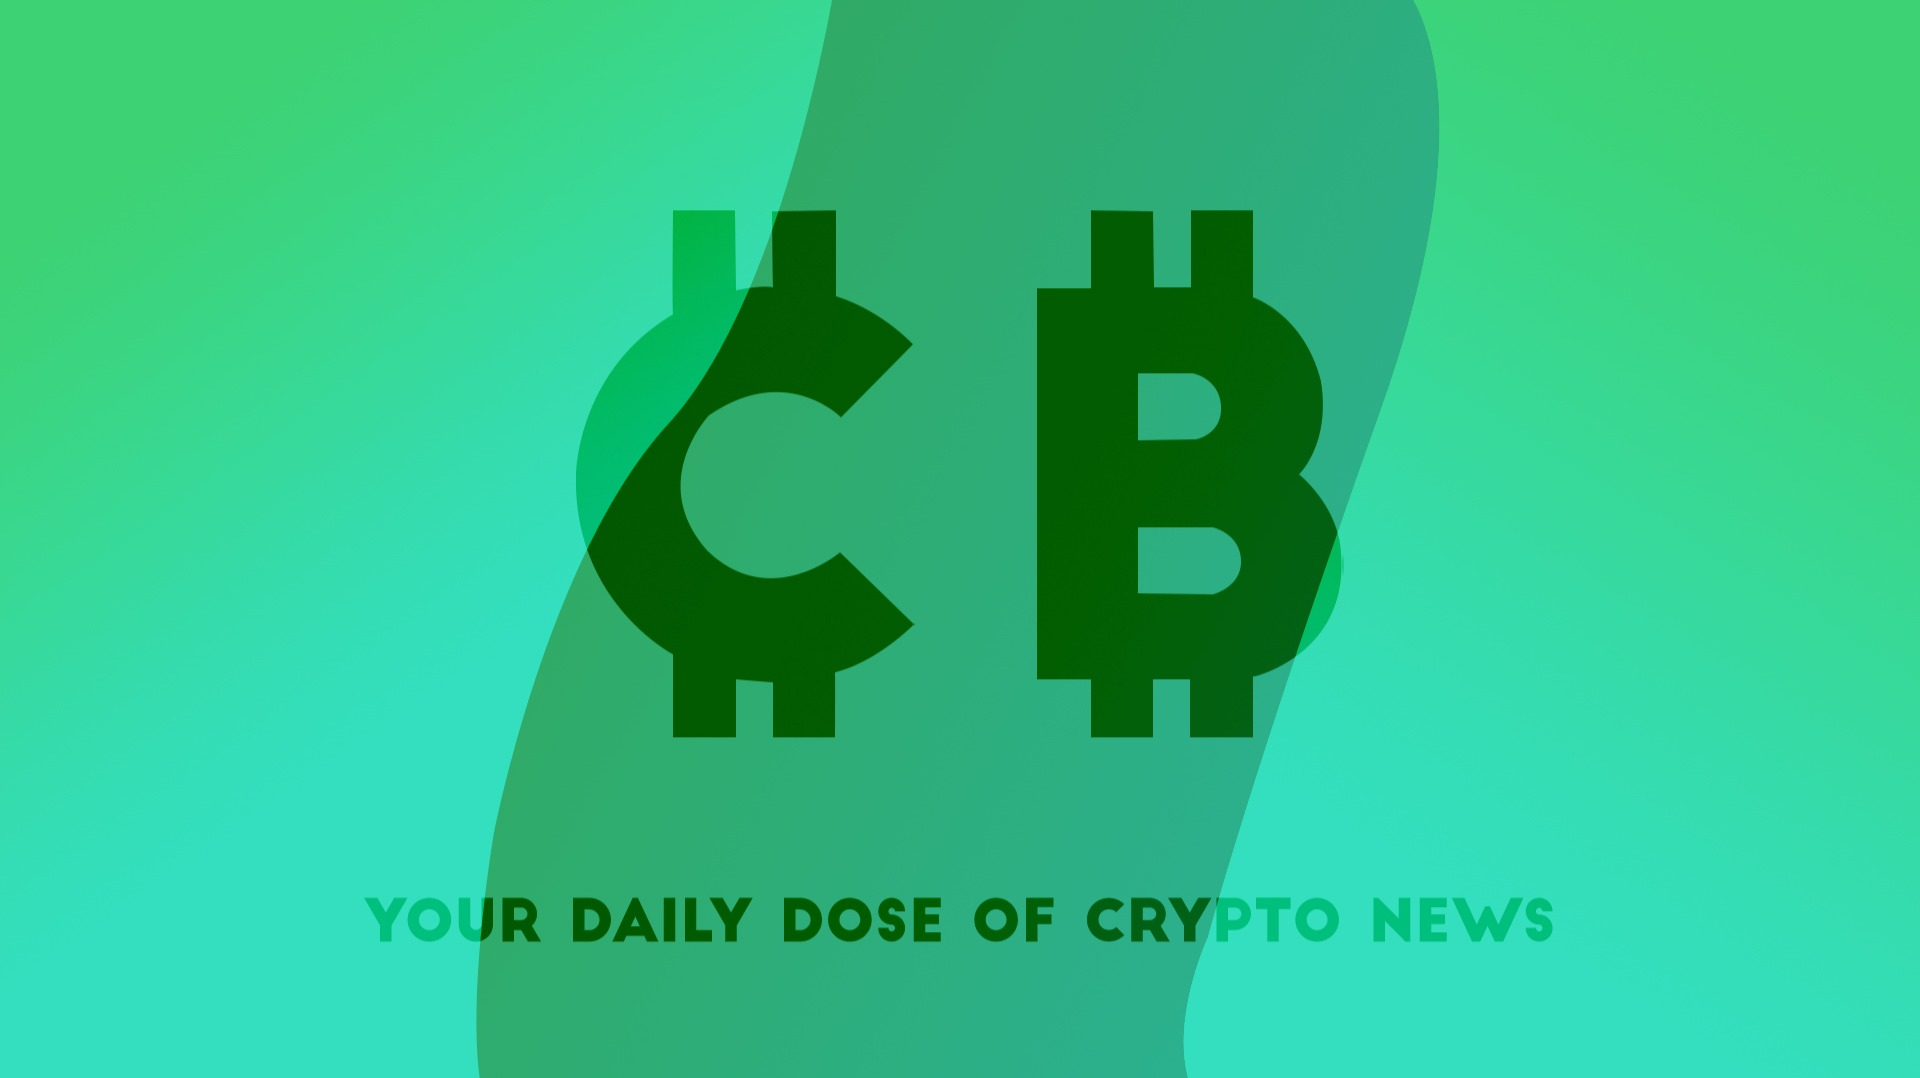 DailyCryptonews by cryptoborges - 30/01/2021